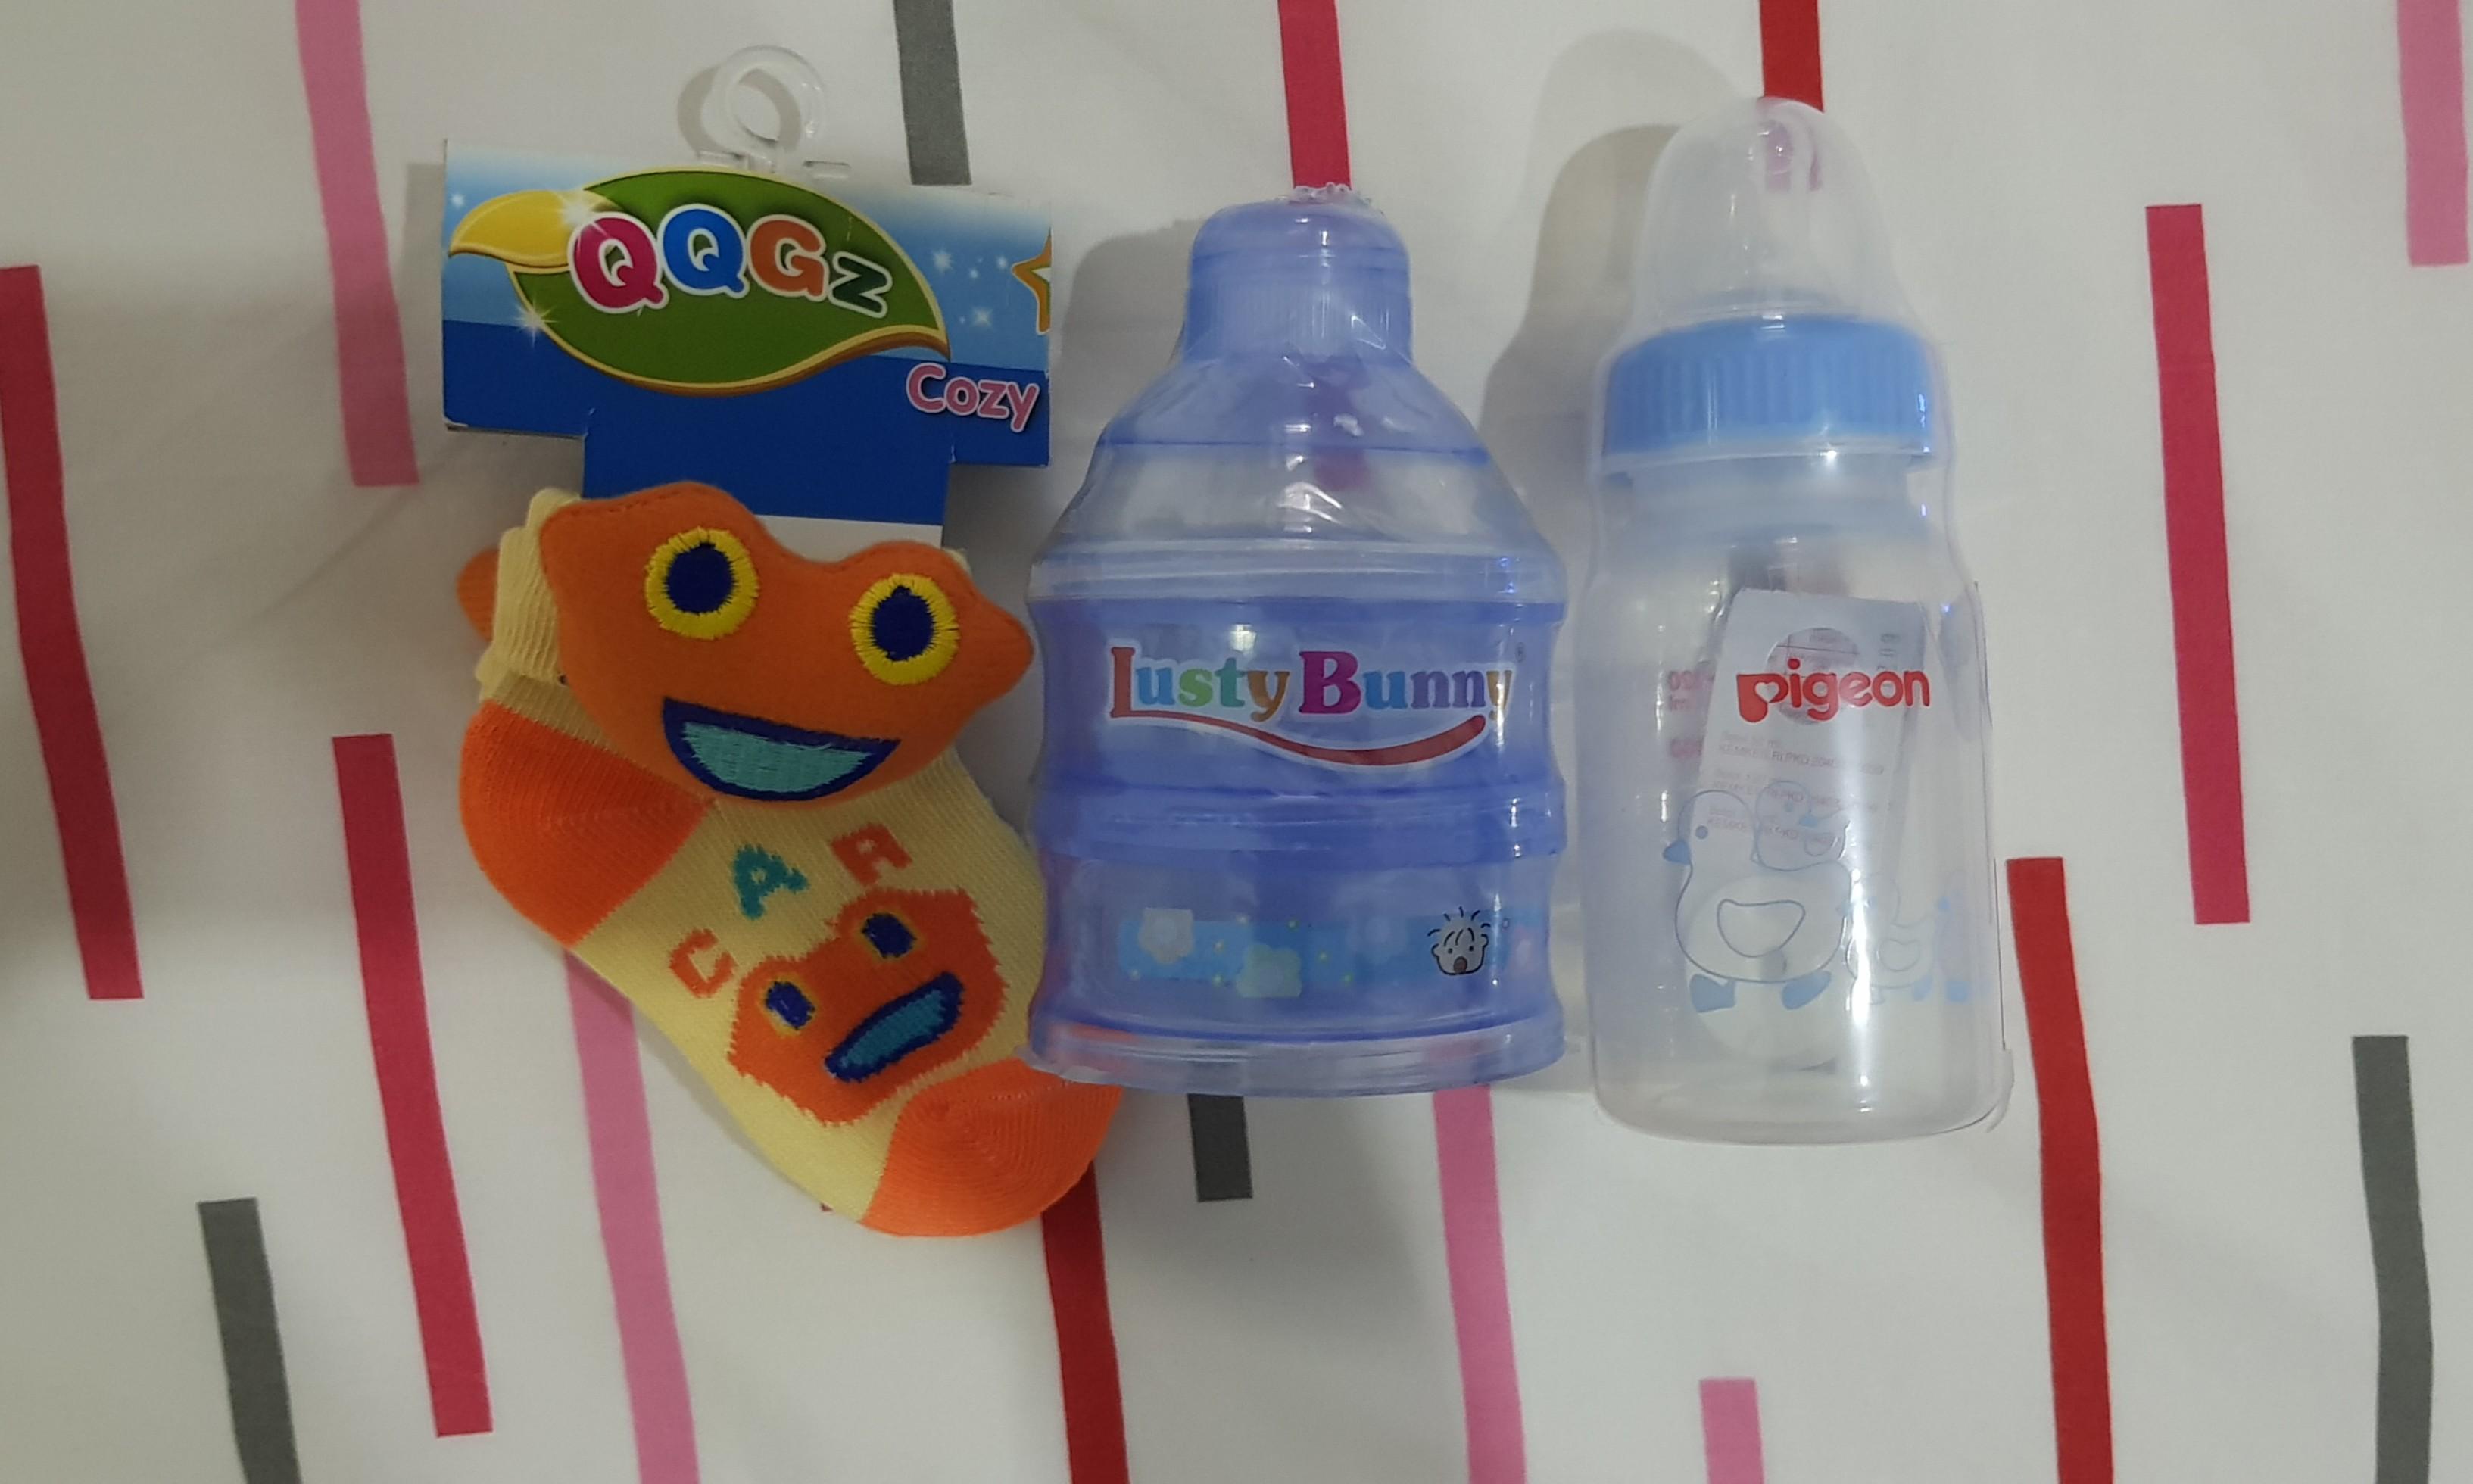 fd720914f695 Take All Botol Pigeon 120ml, Formula Dispenser & Kaos Kaki